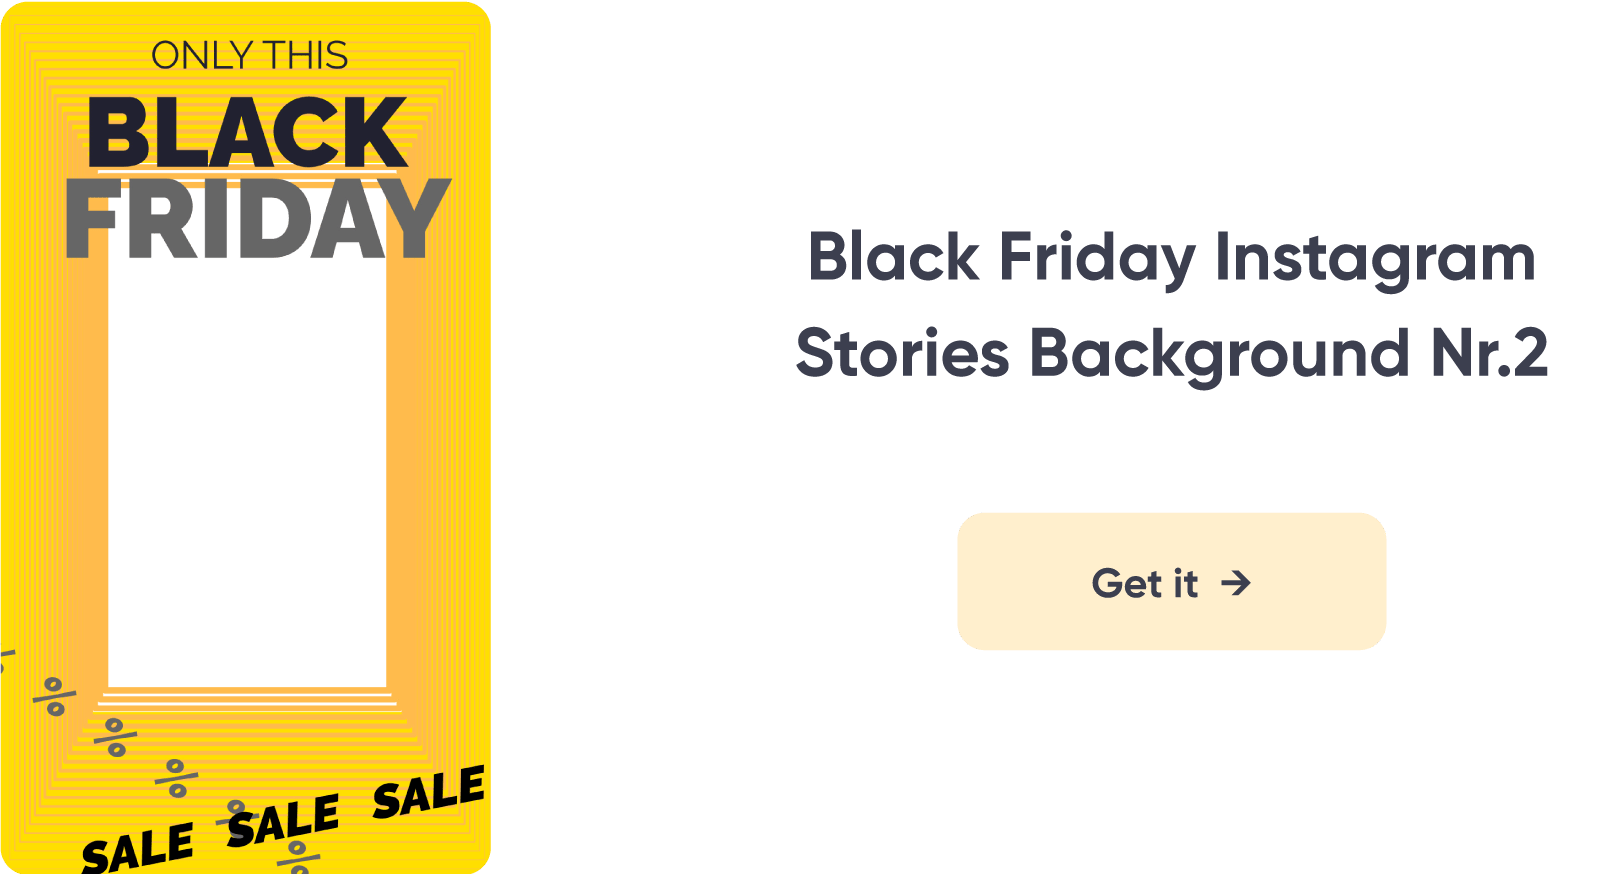 Black Friday Instagram Stories Background 2